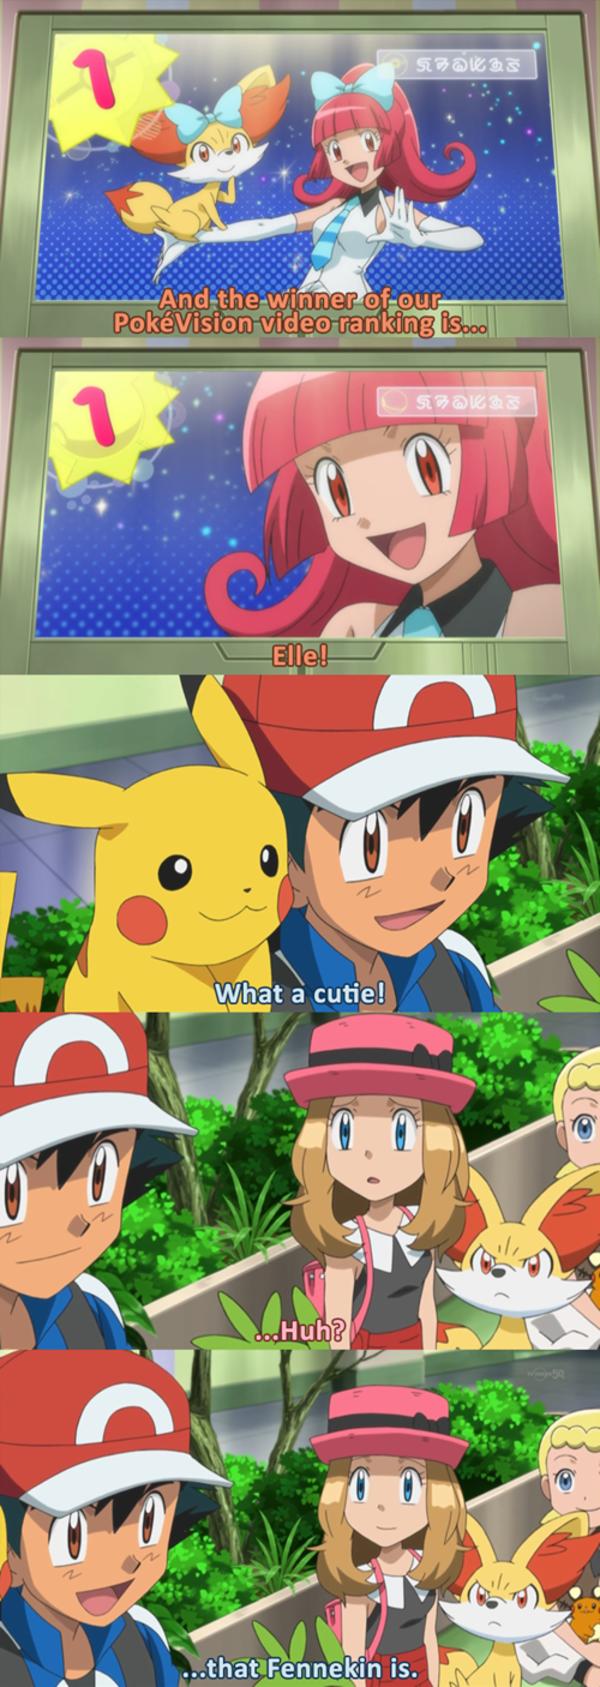 pokemon-serena-fucked